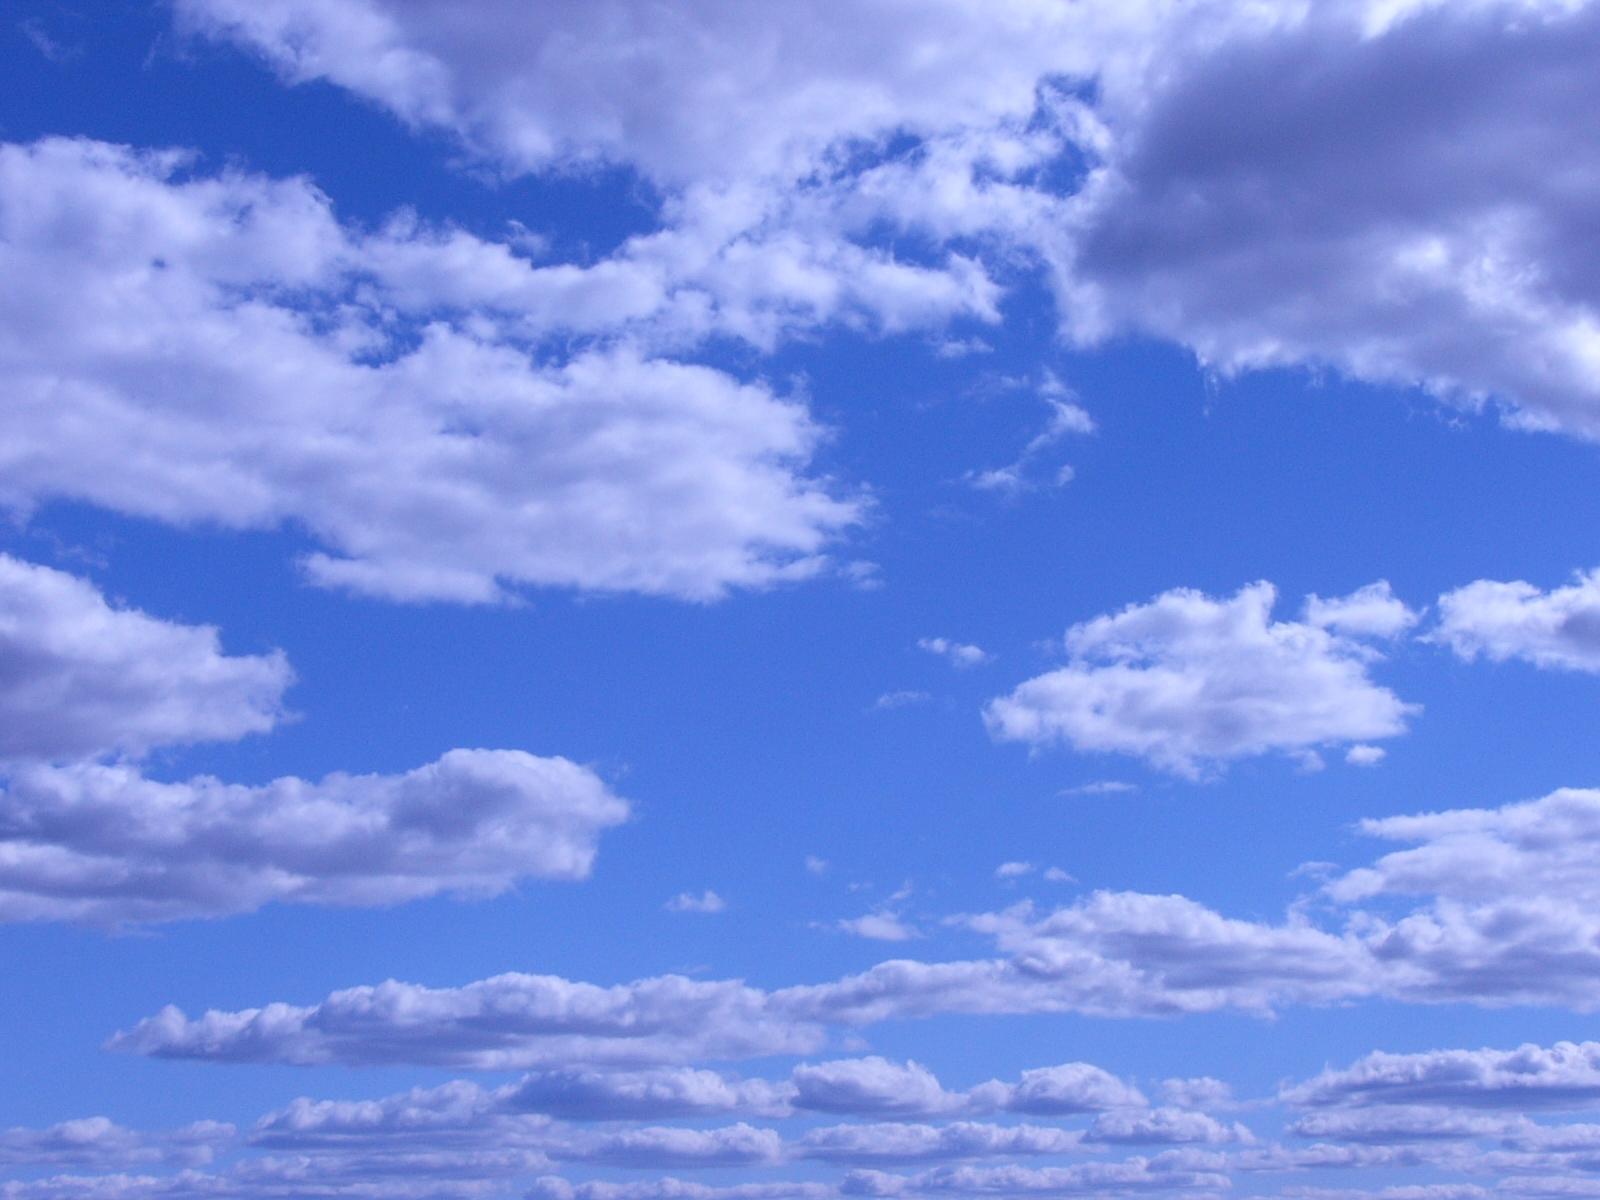 Cloud Desktop Background chillcovercom Cloud Desktop Background 1600x1200